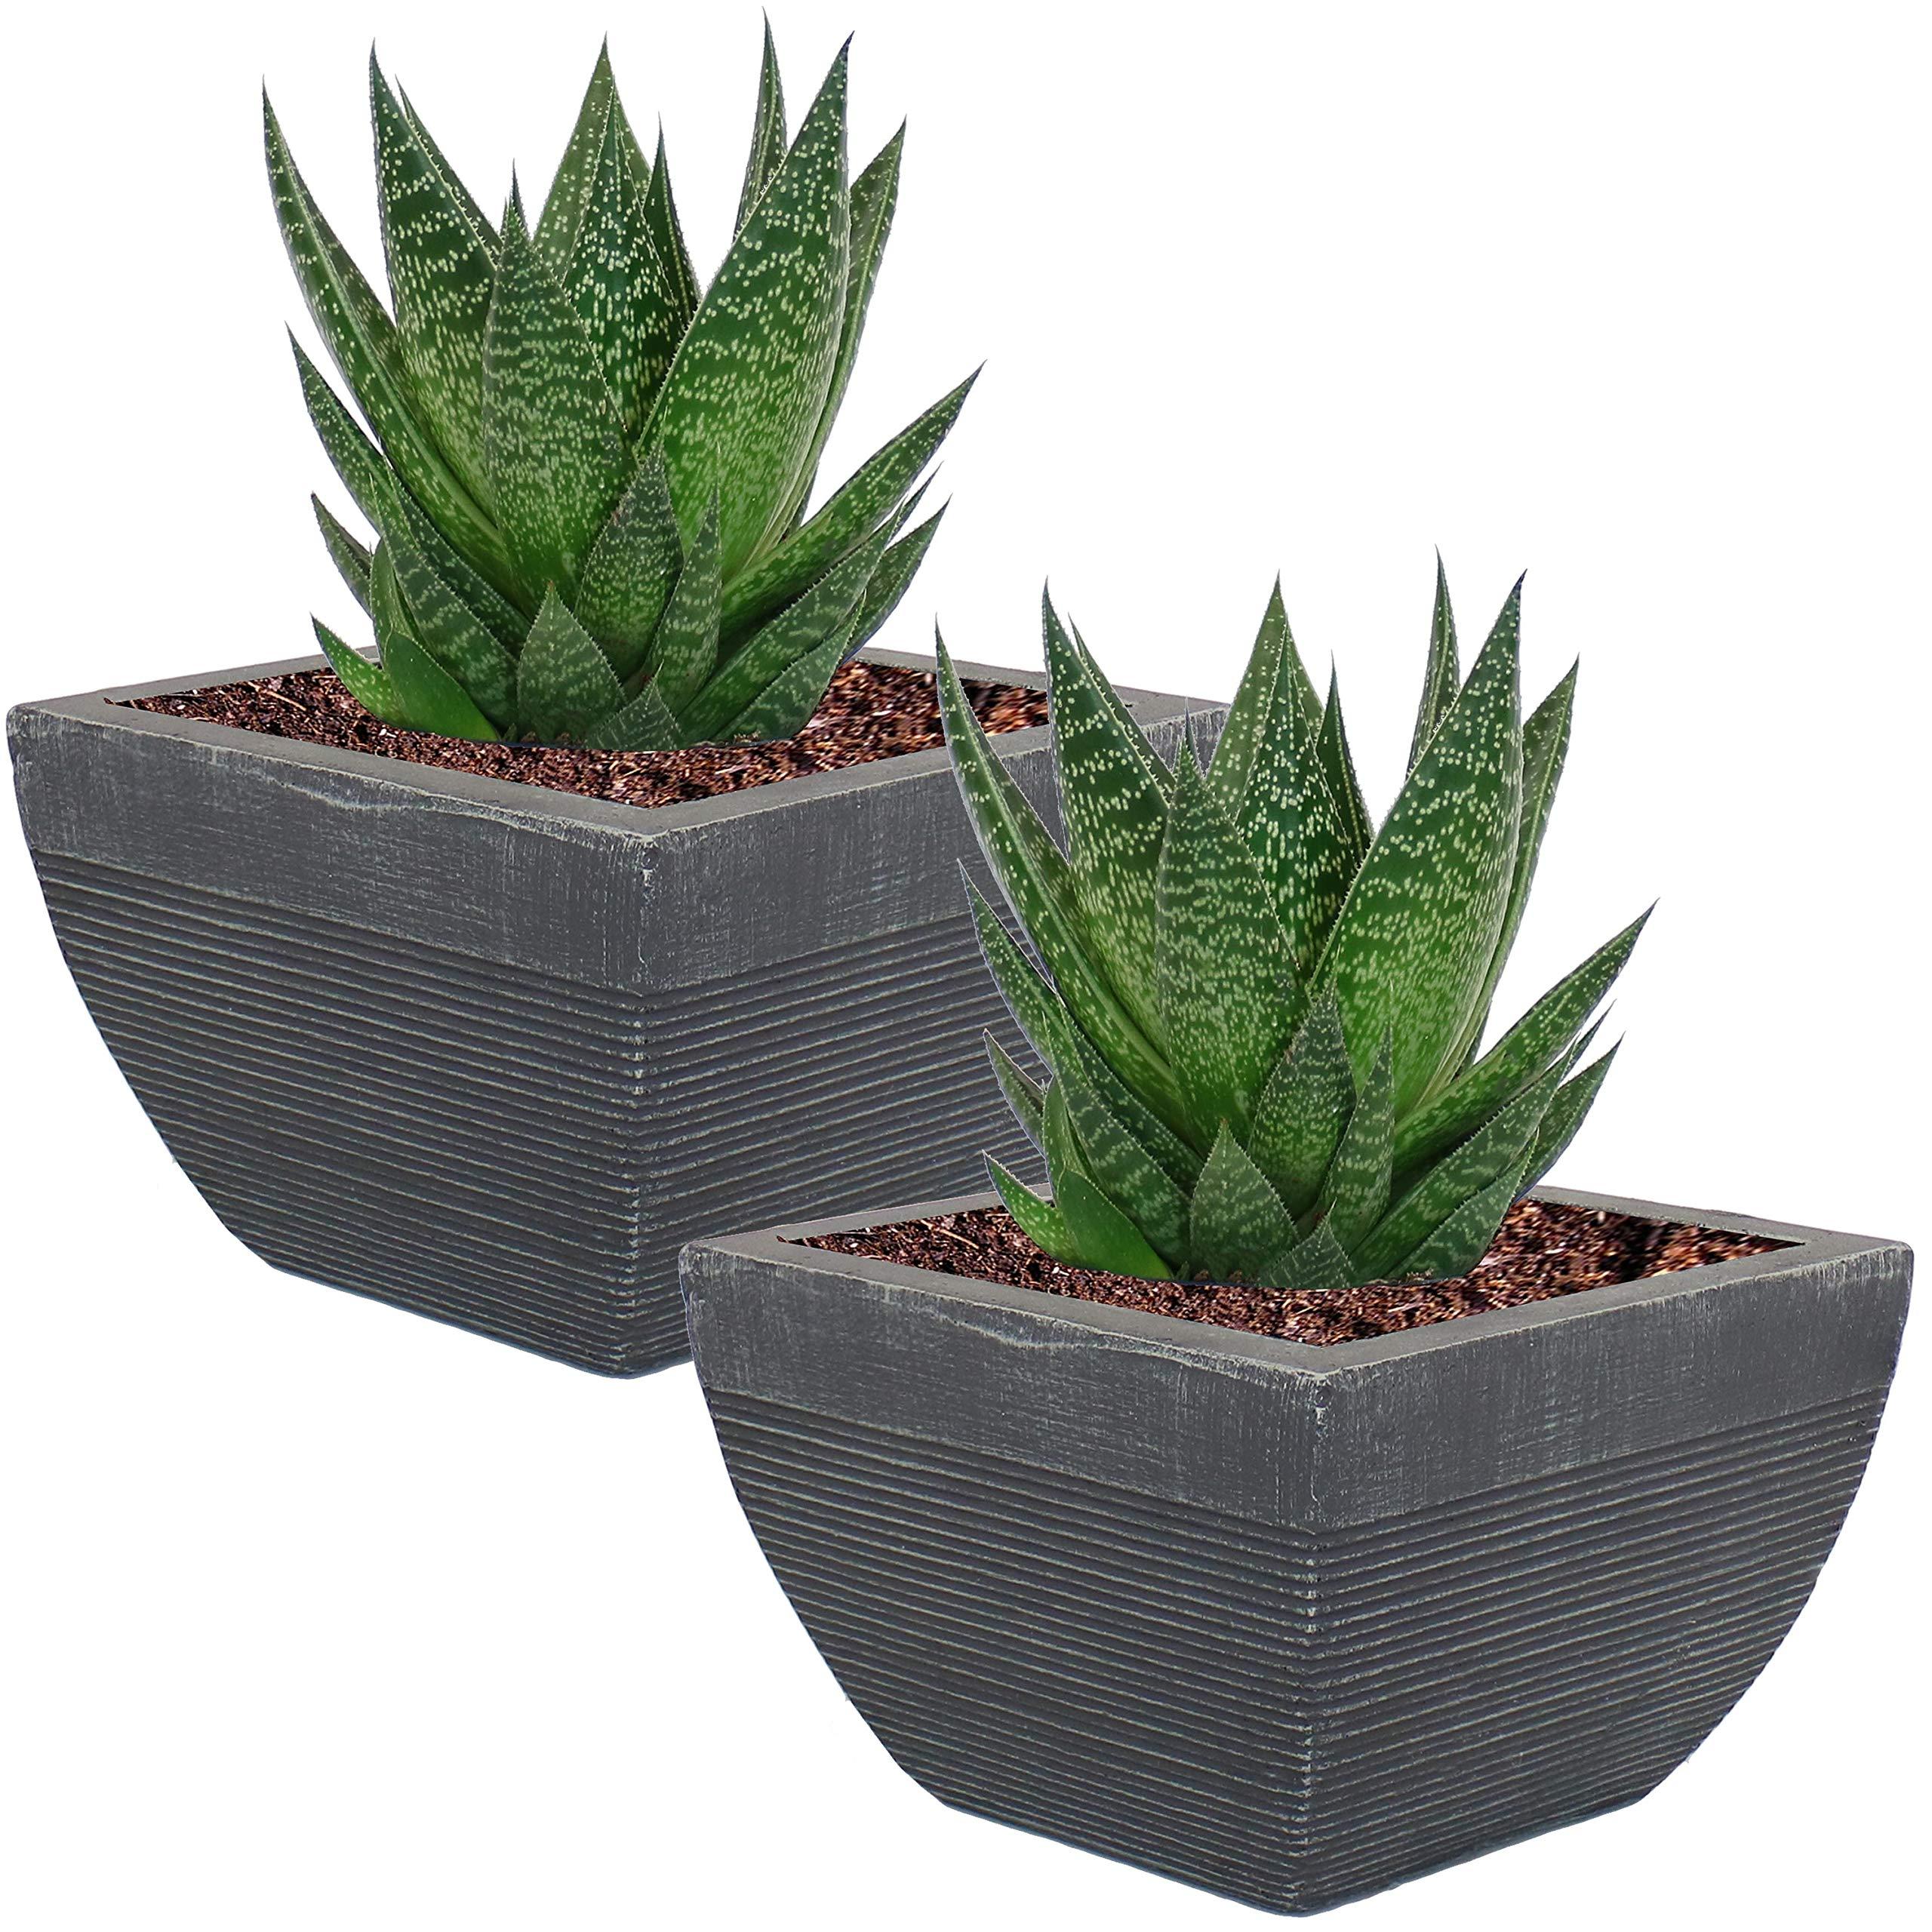 Sunnydaze Residency Fiber Clay Modern Planter Flower Pot, Durable Indoor/Outdoor 8-Inch Set of 2